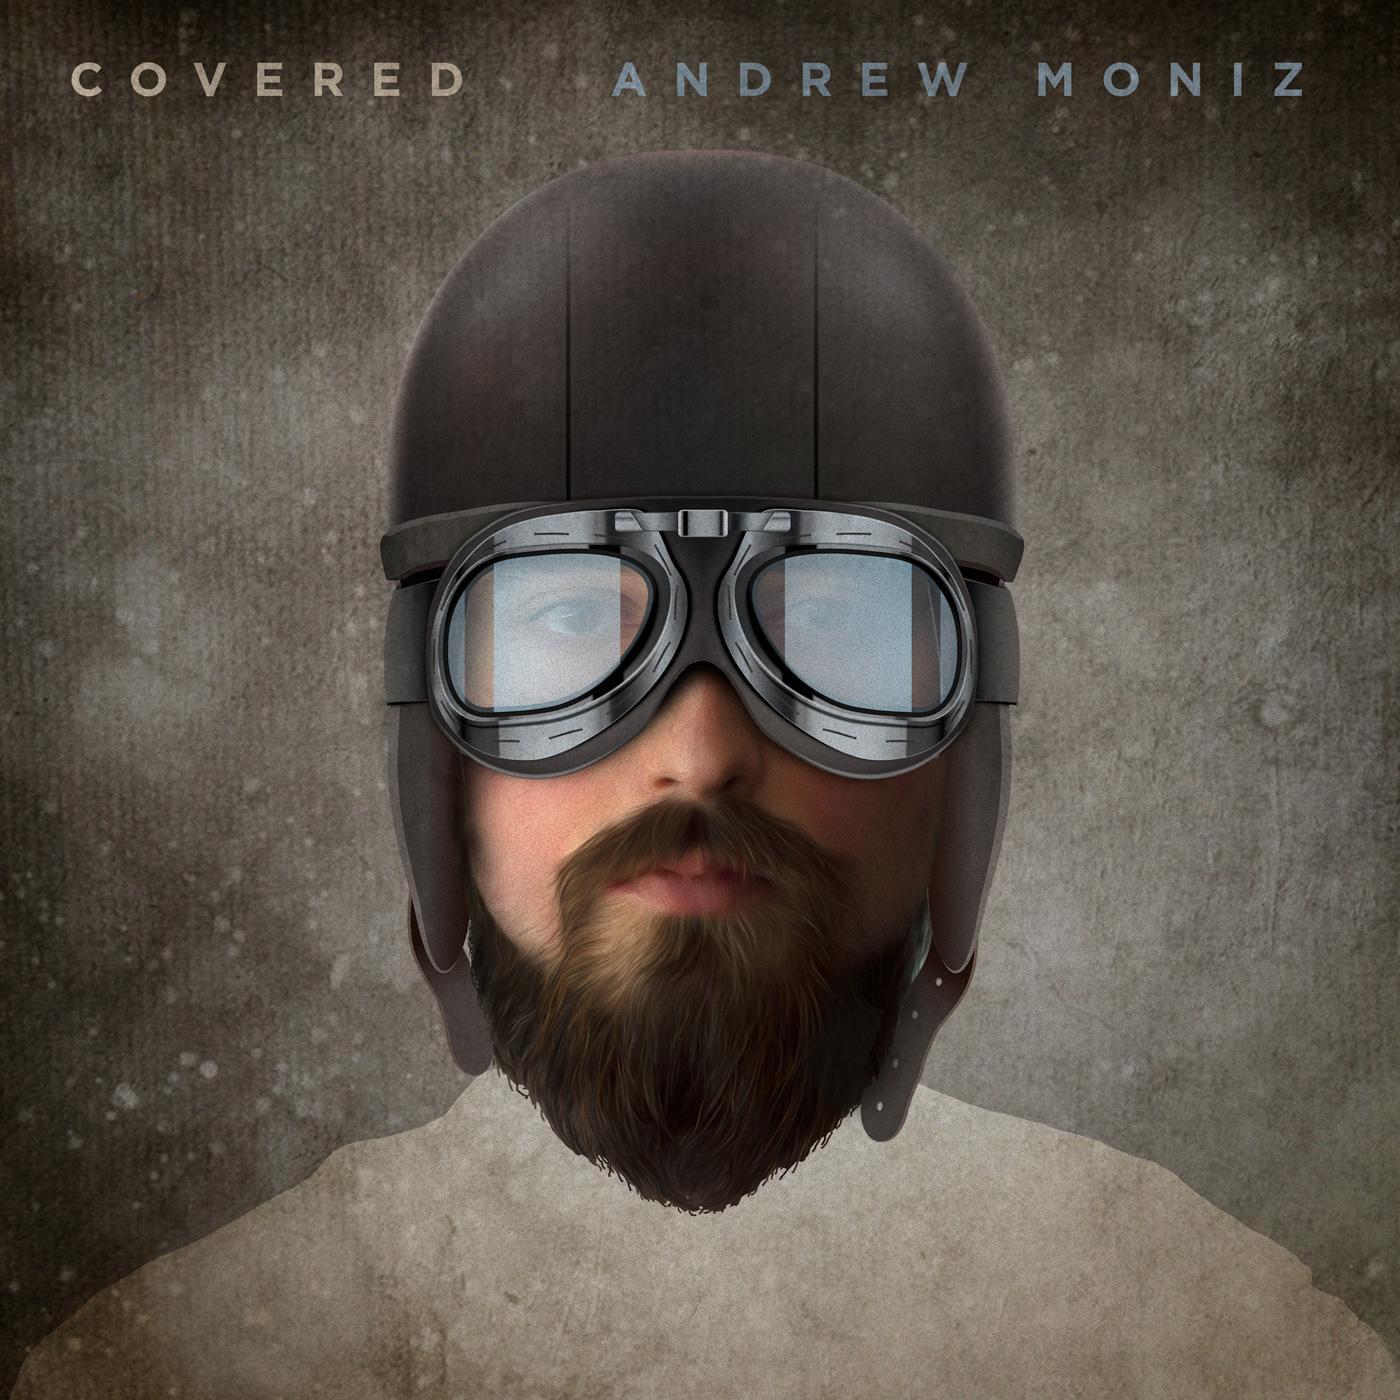 Covered by Andrew Moniz